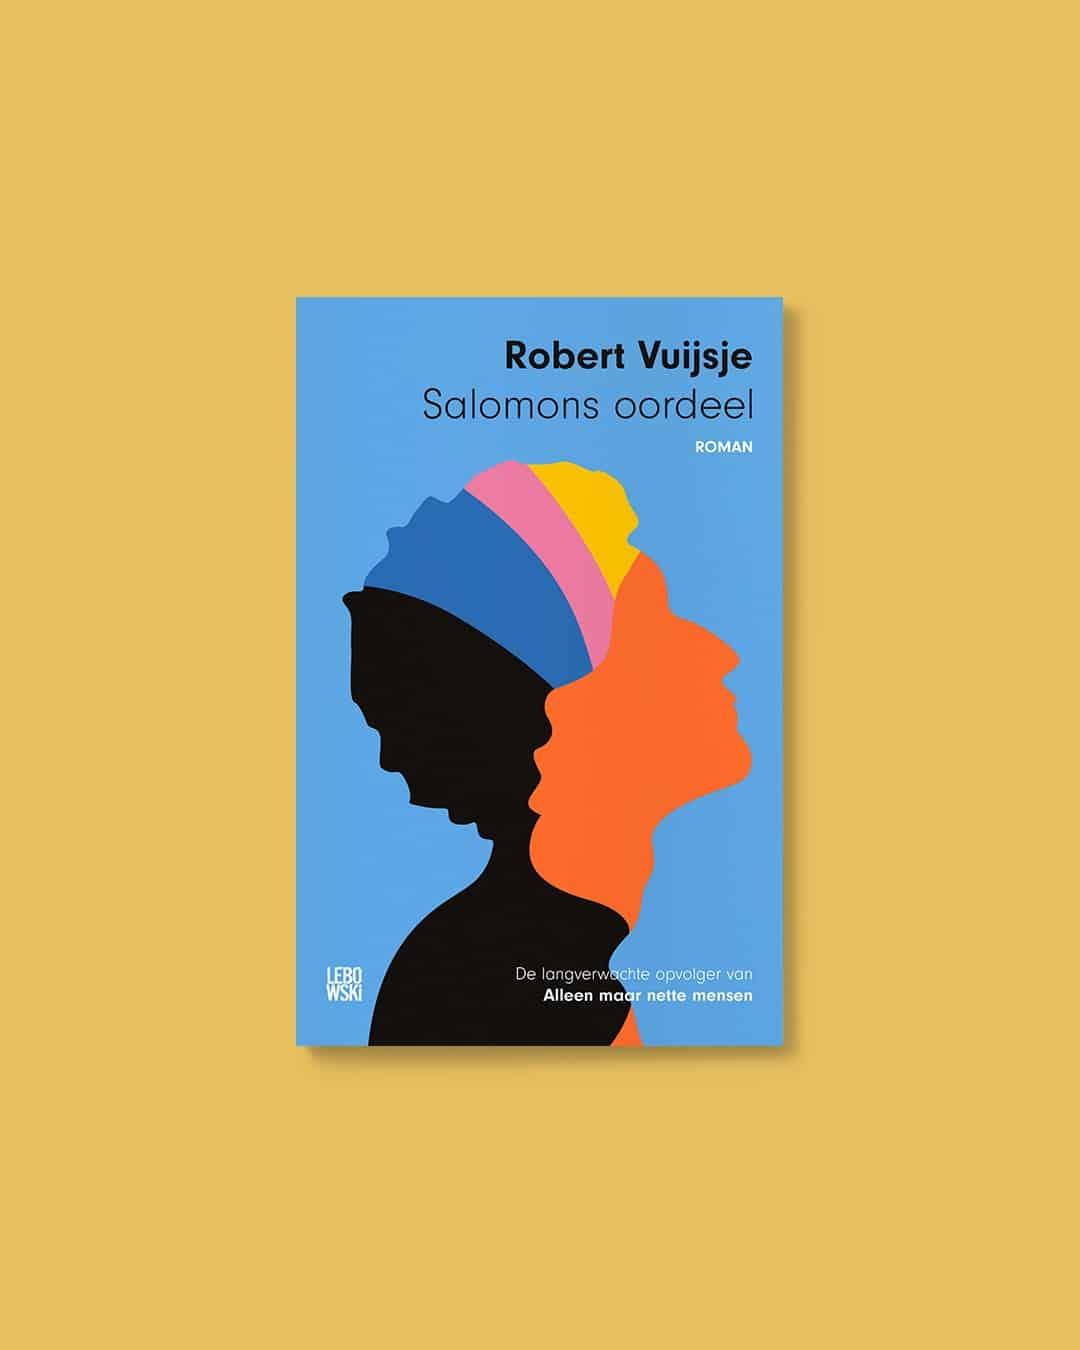 Book_cover_portrait_2019_newsizewebsite4